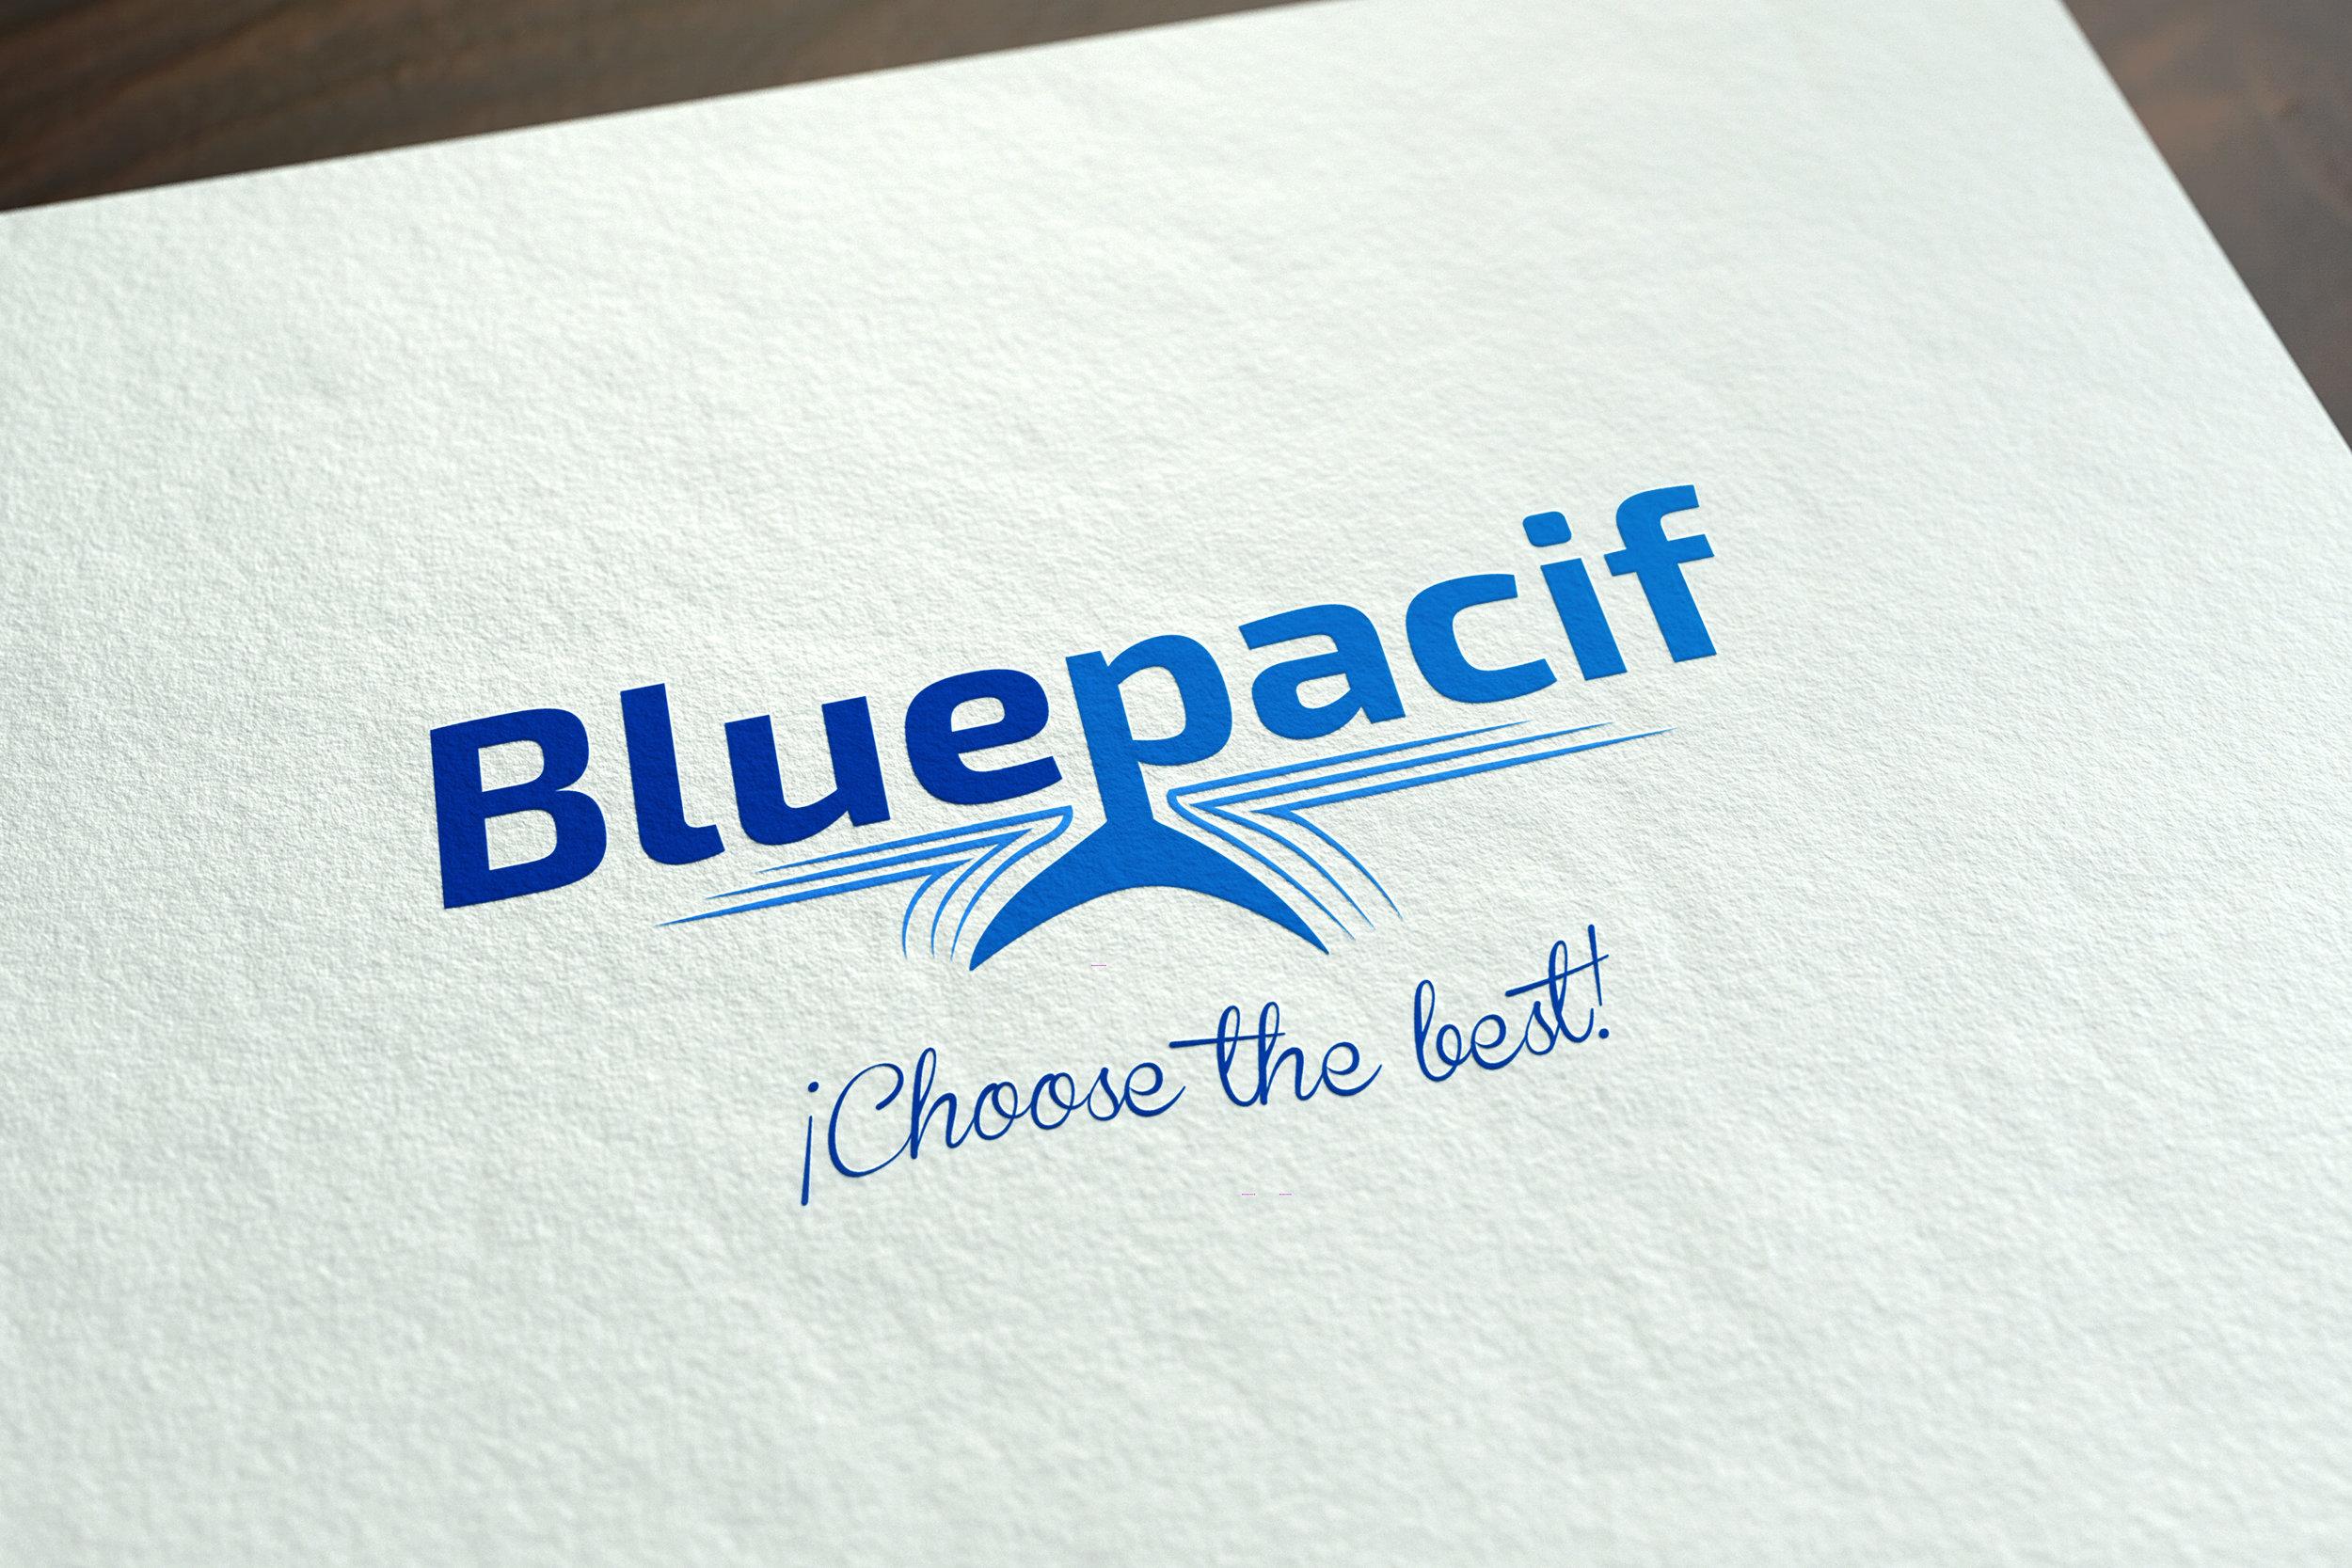 BLuePacif.jpg